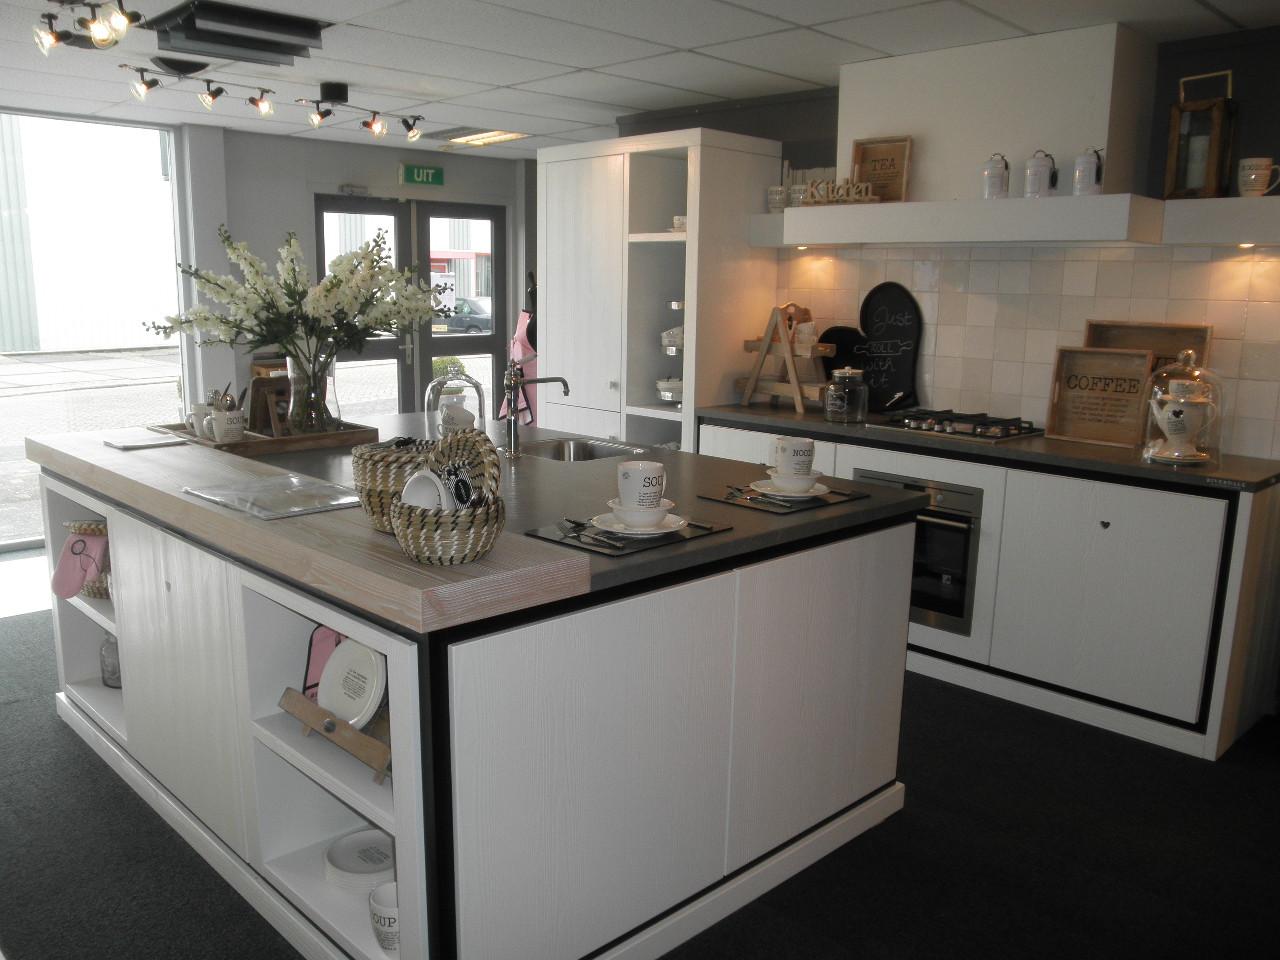 Keuken Zwart Stoere : Riverdale keukens: stylish sfeervol & stoer nieuws startpagina